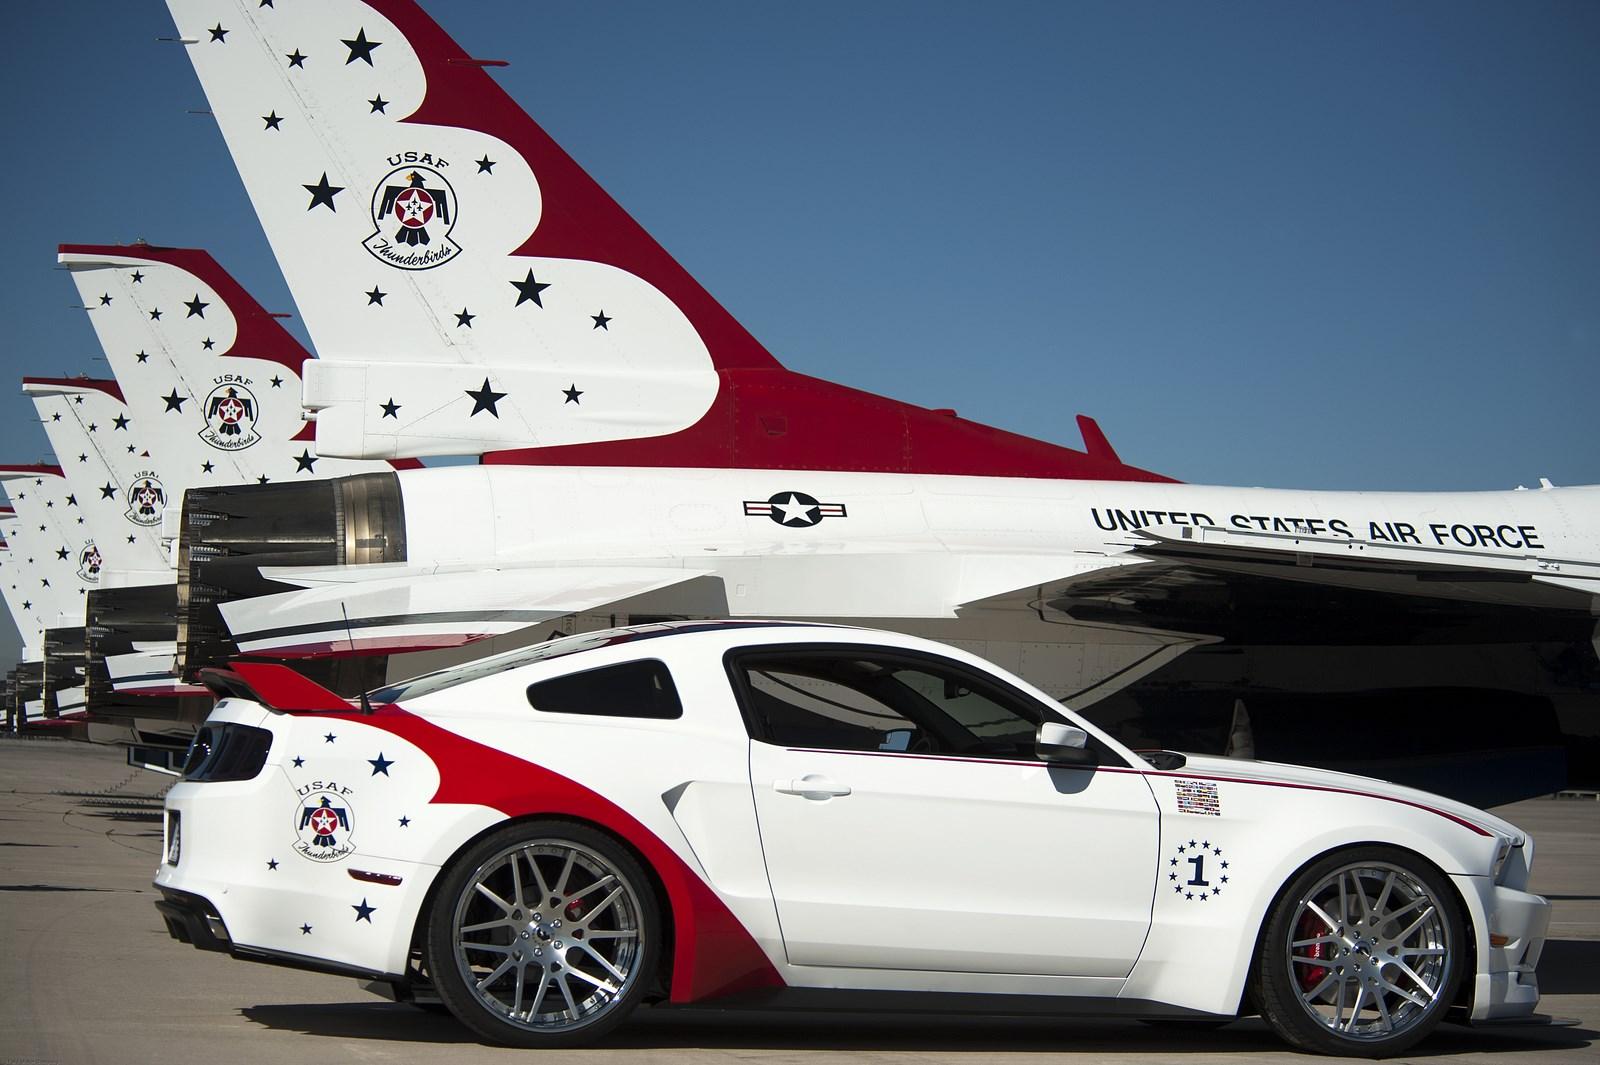 mustang us air force.